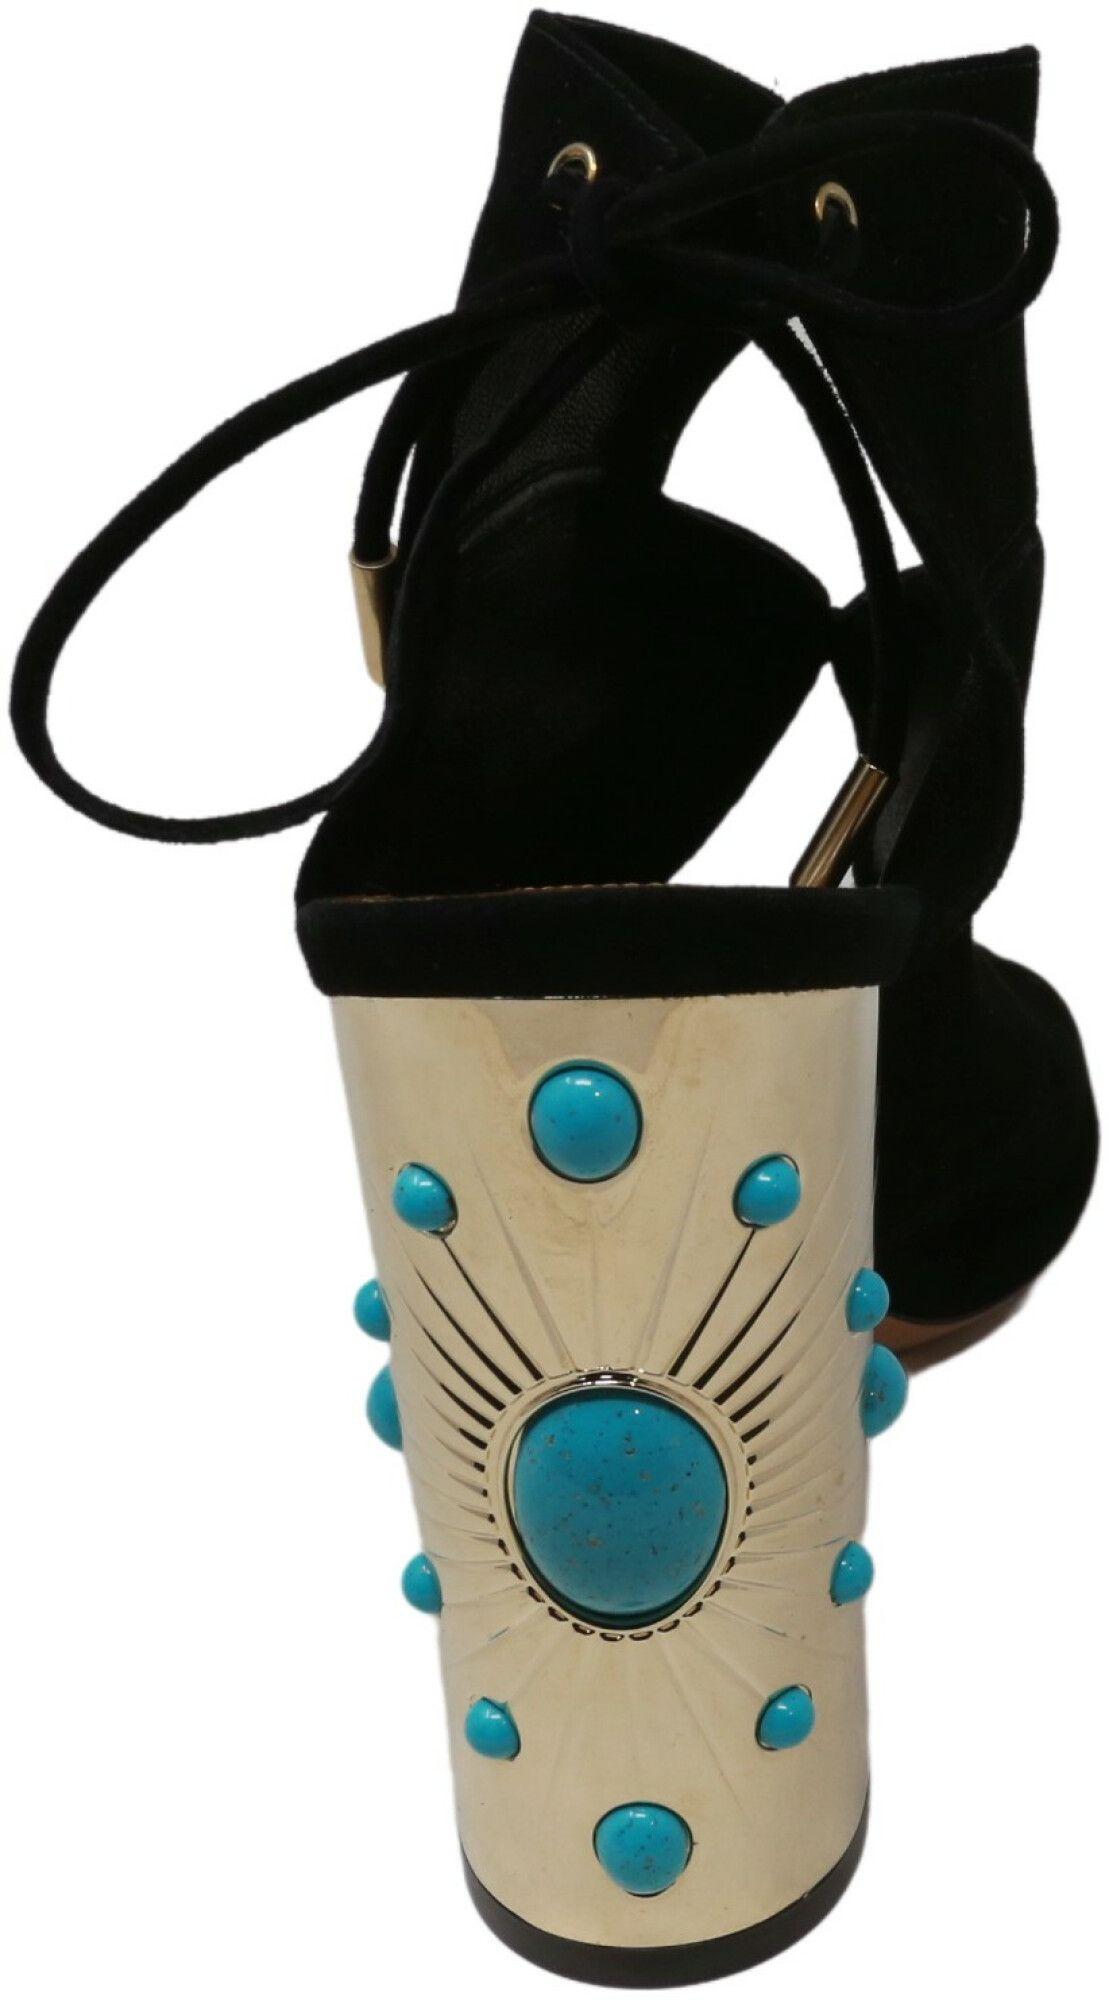 Aquazzura Firenze Women's Pasadena Sun Sandal Leather Pump